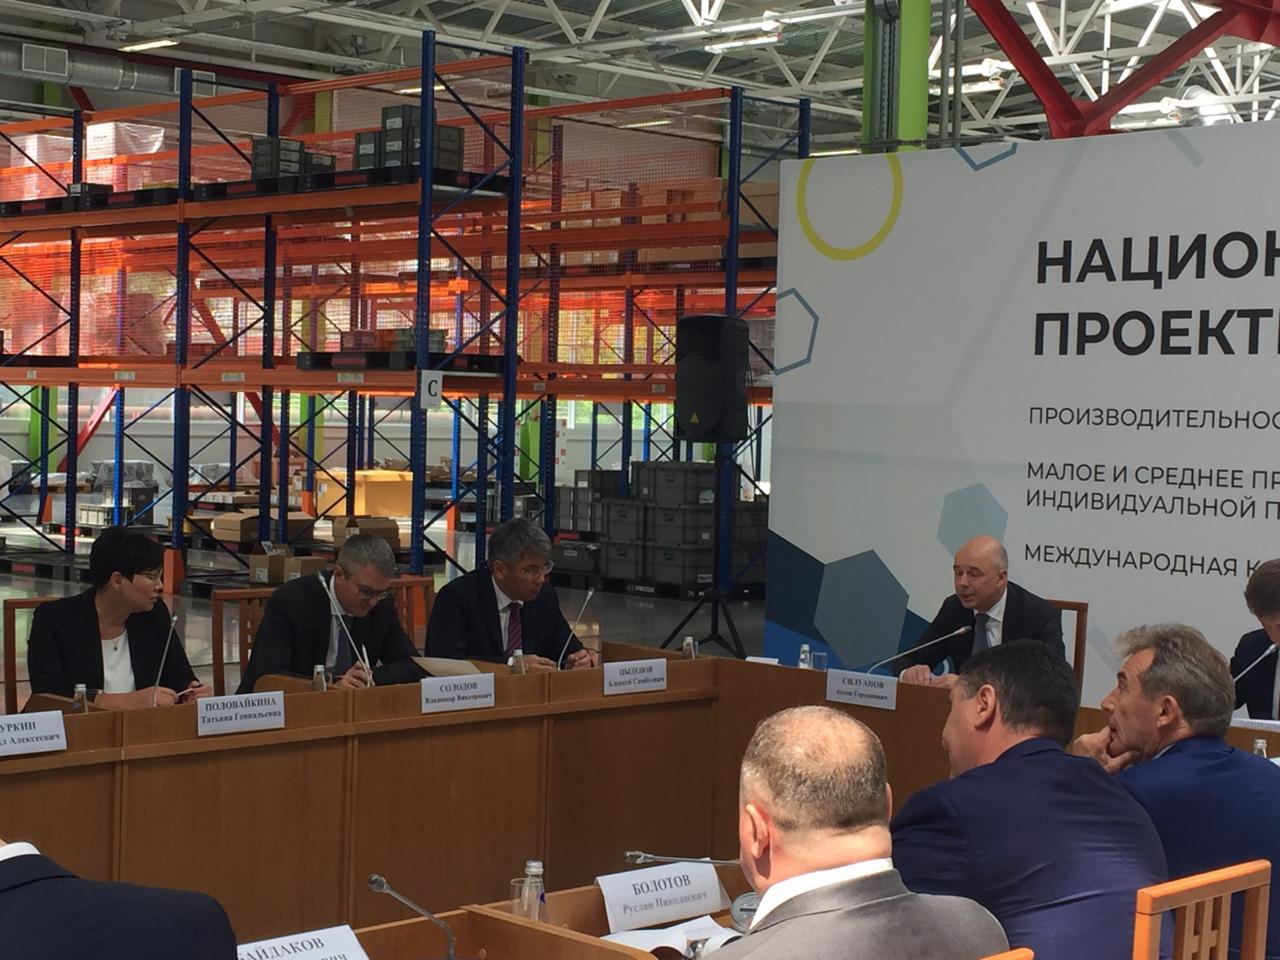 Антон Силуанов обсудил с регионами реализацию нацпроектов